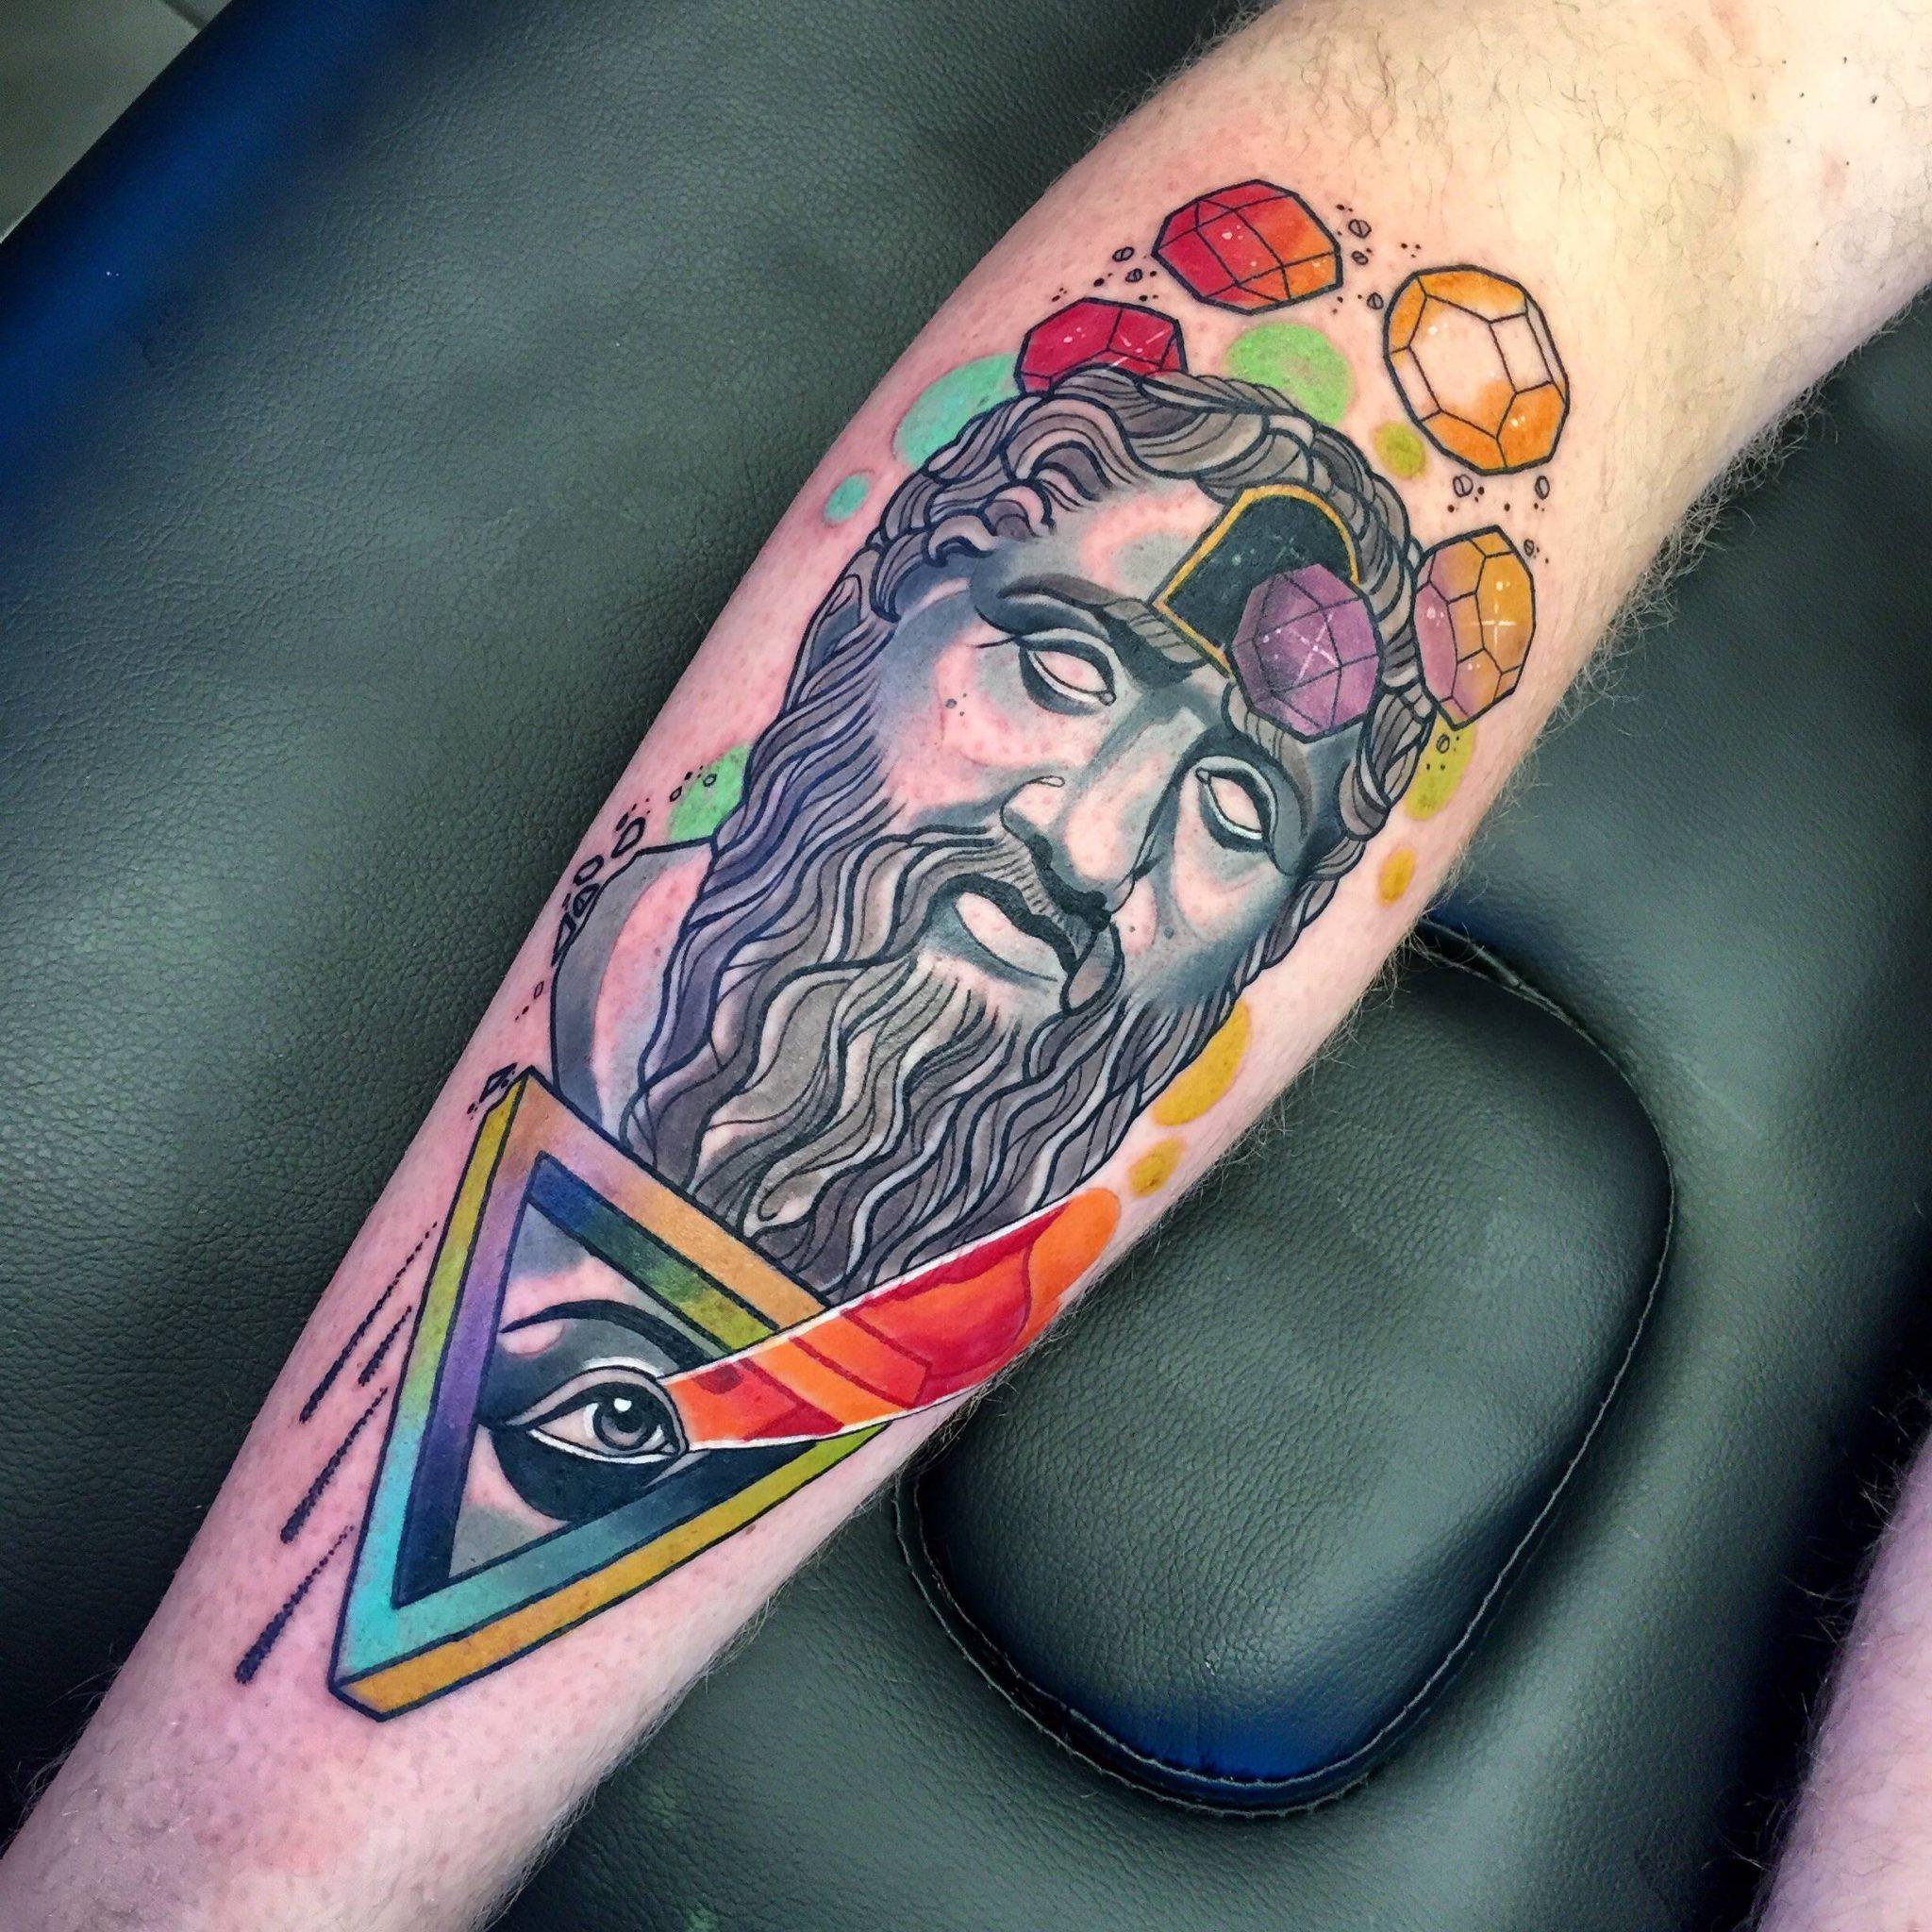 Tattoo Artists in Leeds